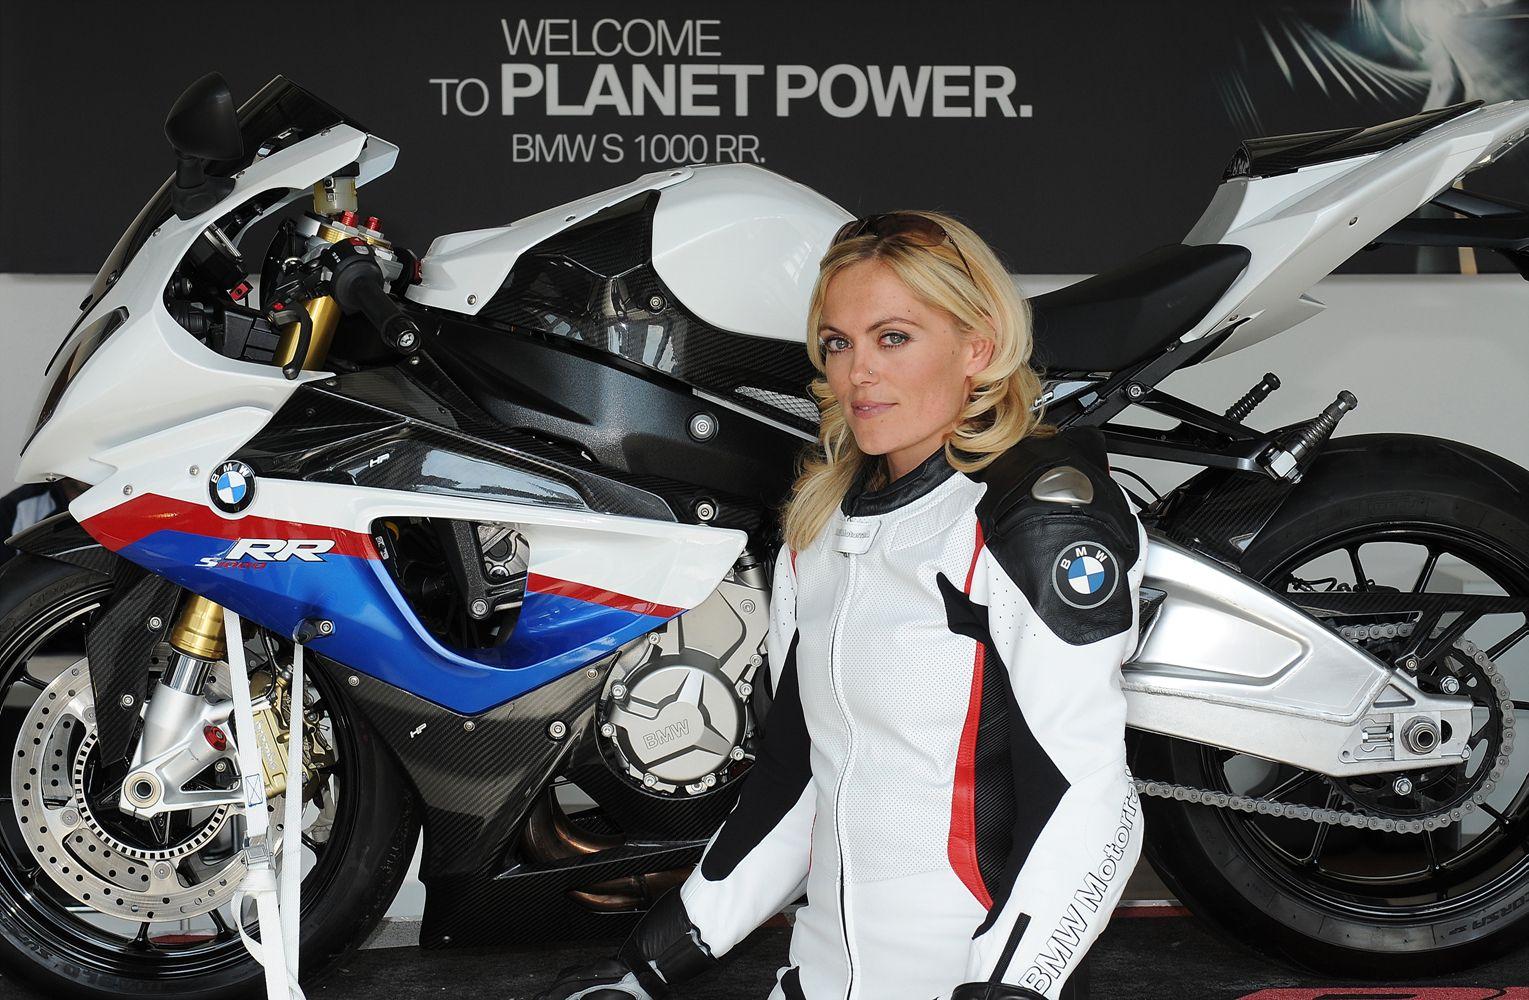 Katja Poensgen - One of the best known female motorcycle ...